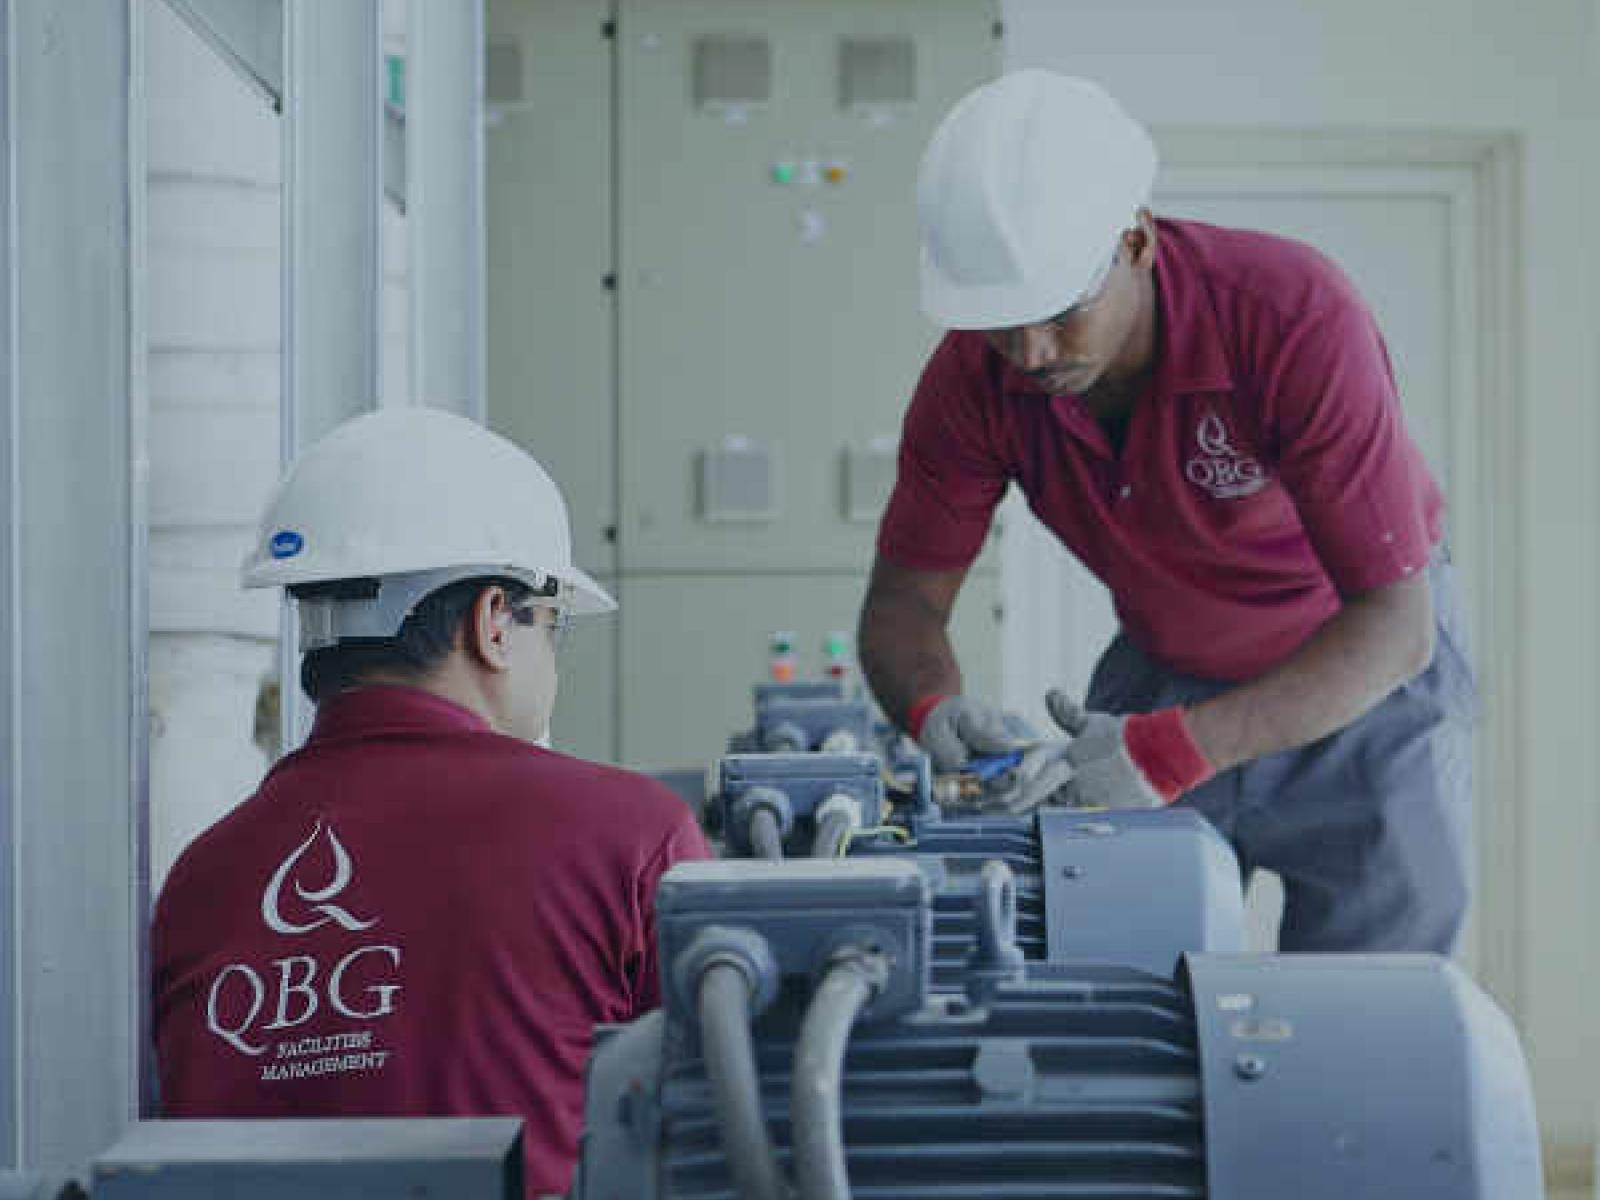 QBG Facilities Management Group